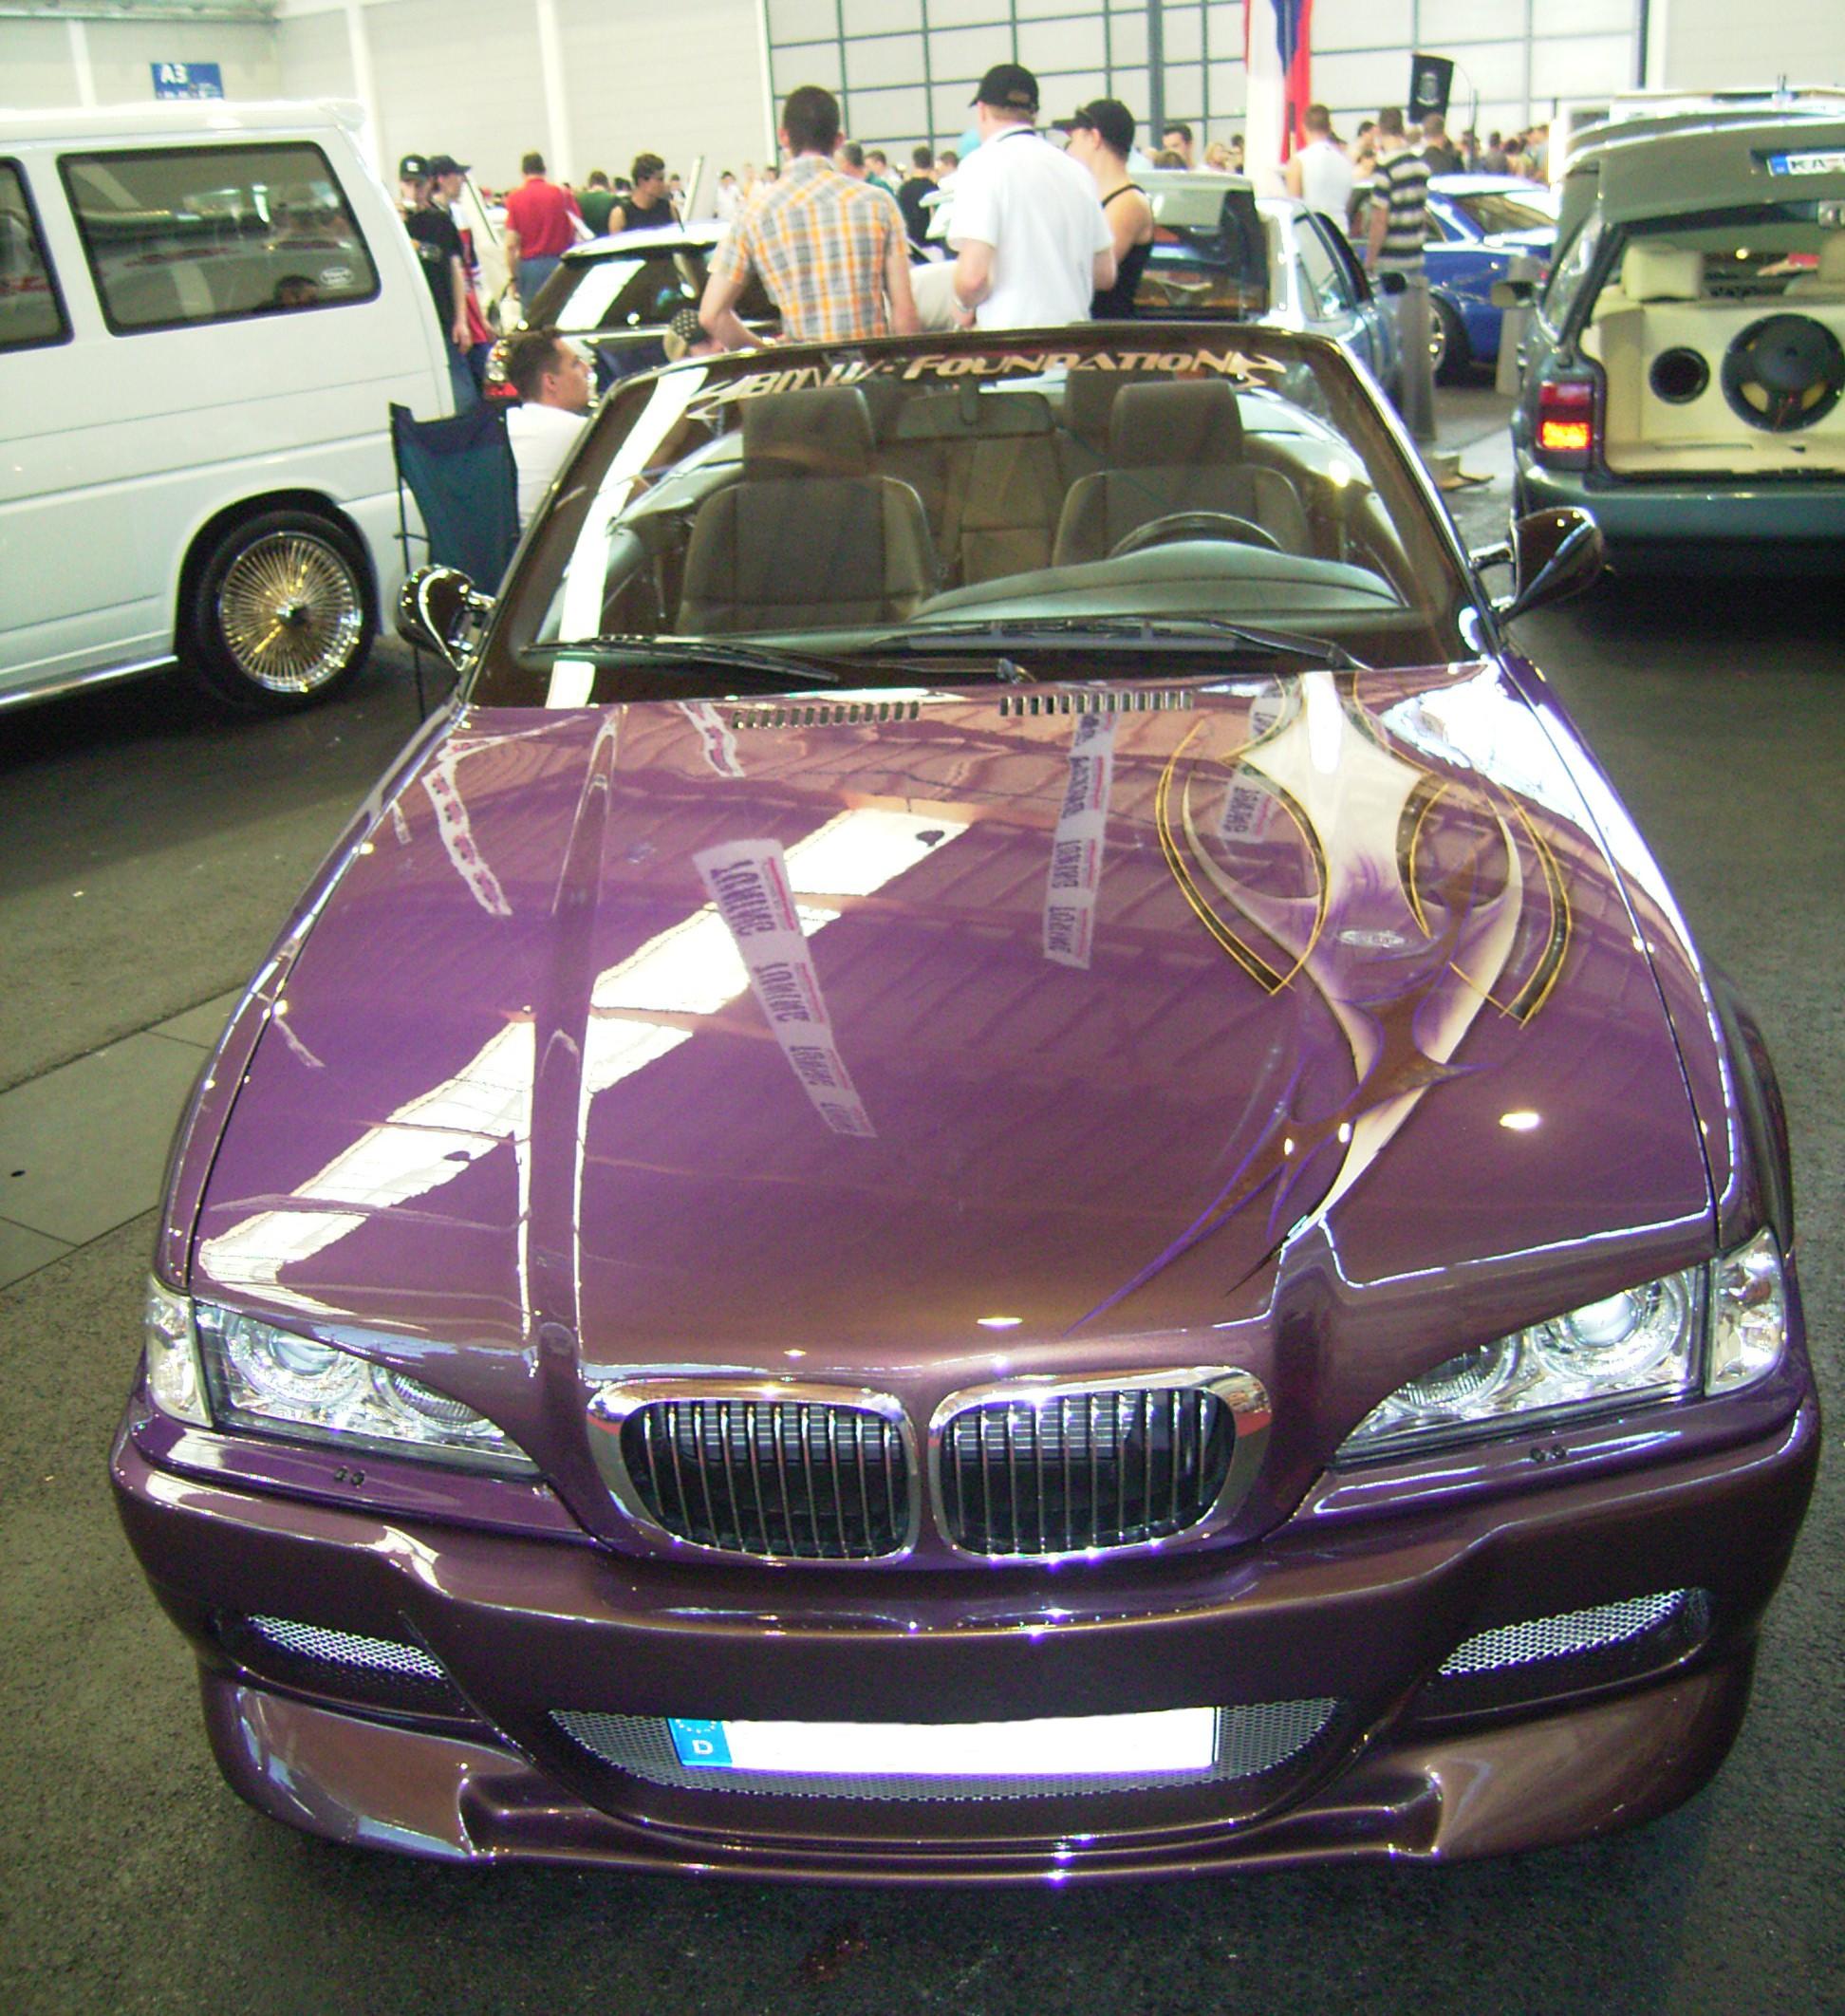 BMW mit Bösem Blick